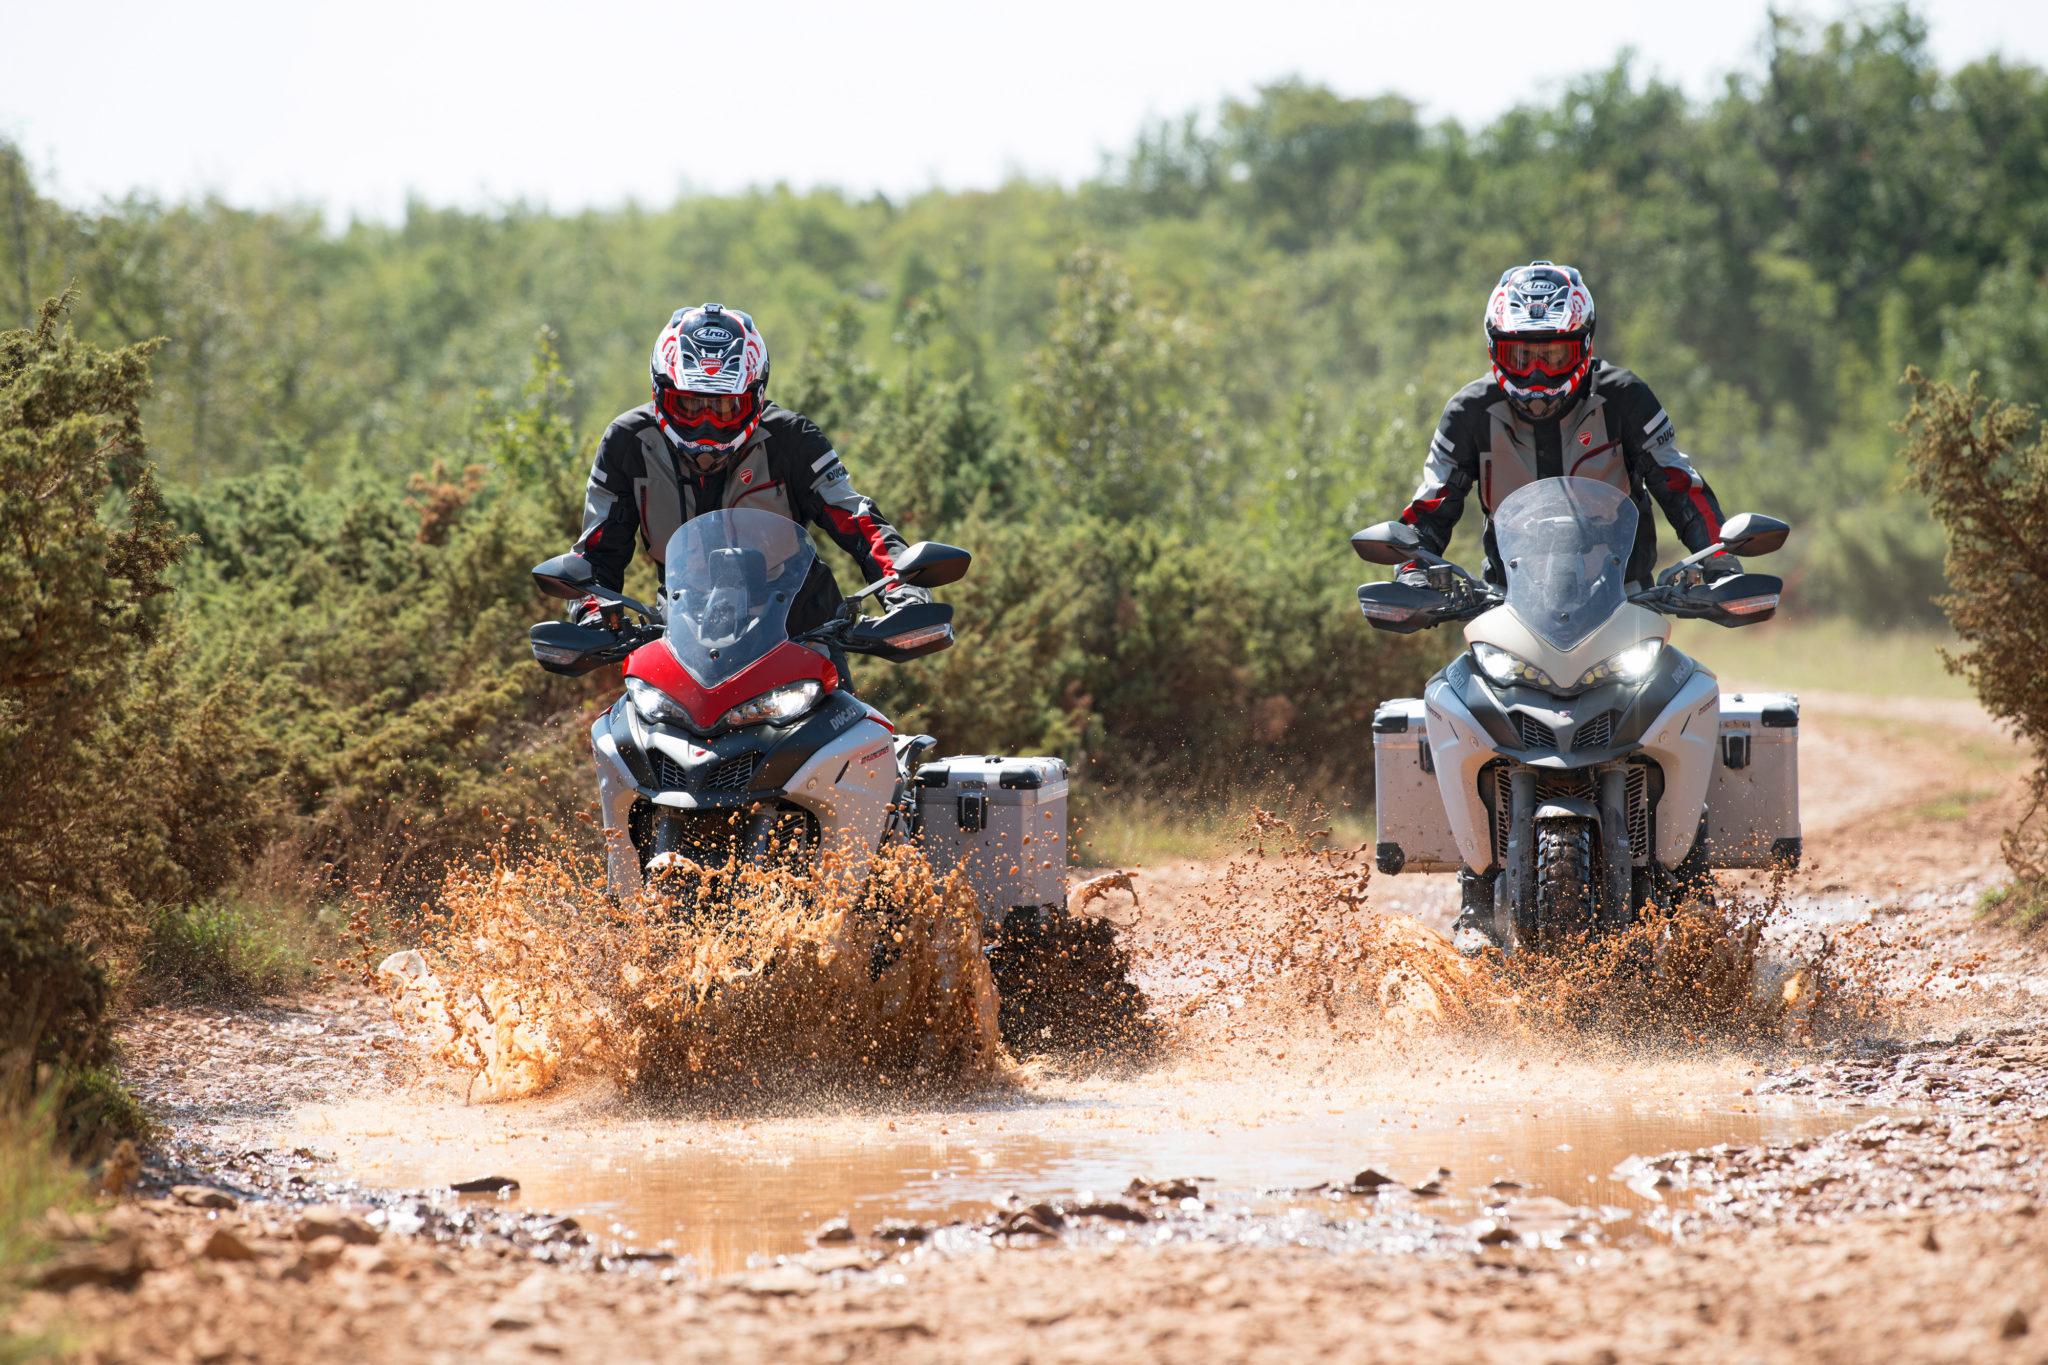 Ducati Multistrada 1260 Enduro: Adventure without limits